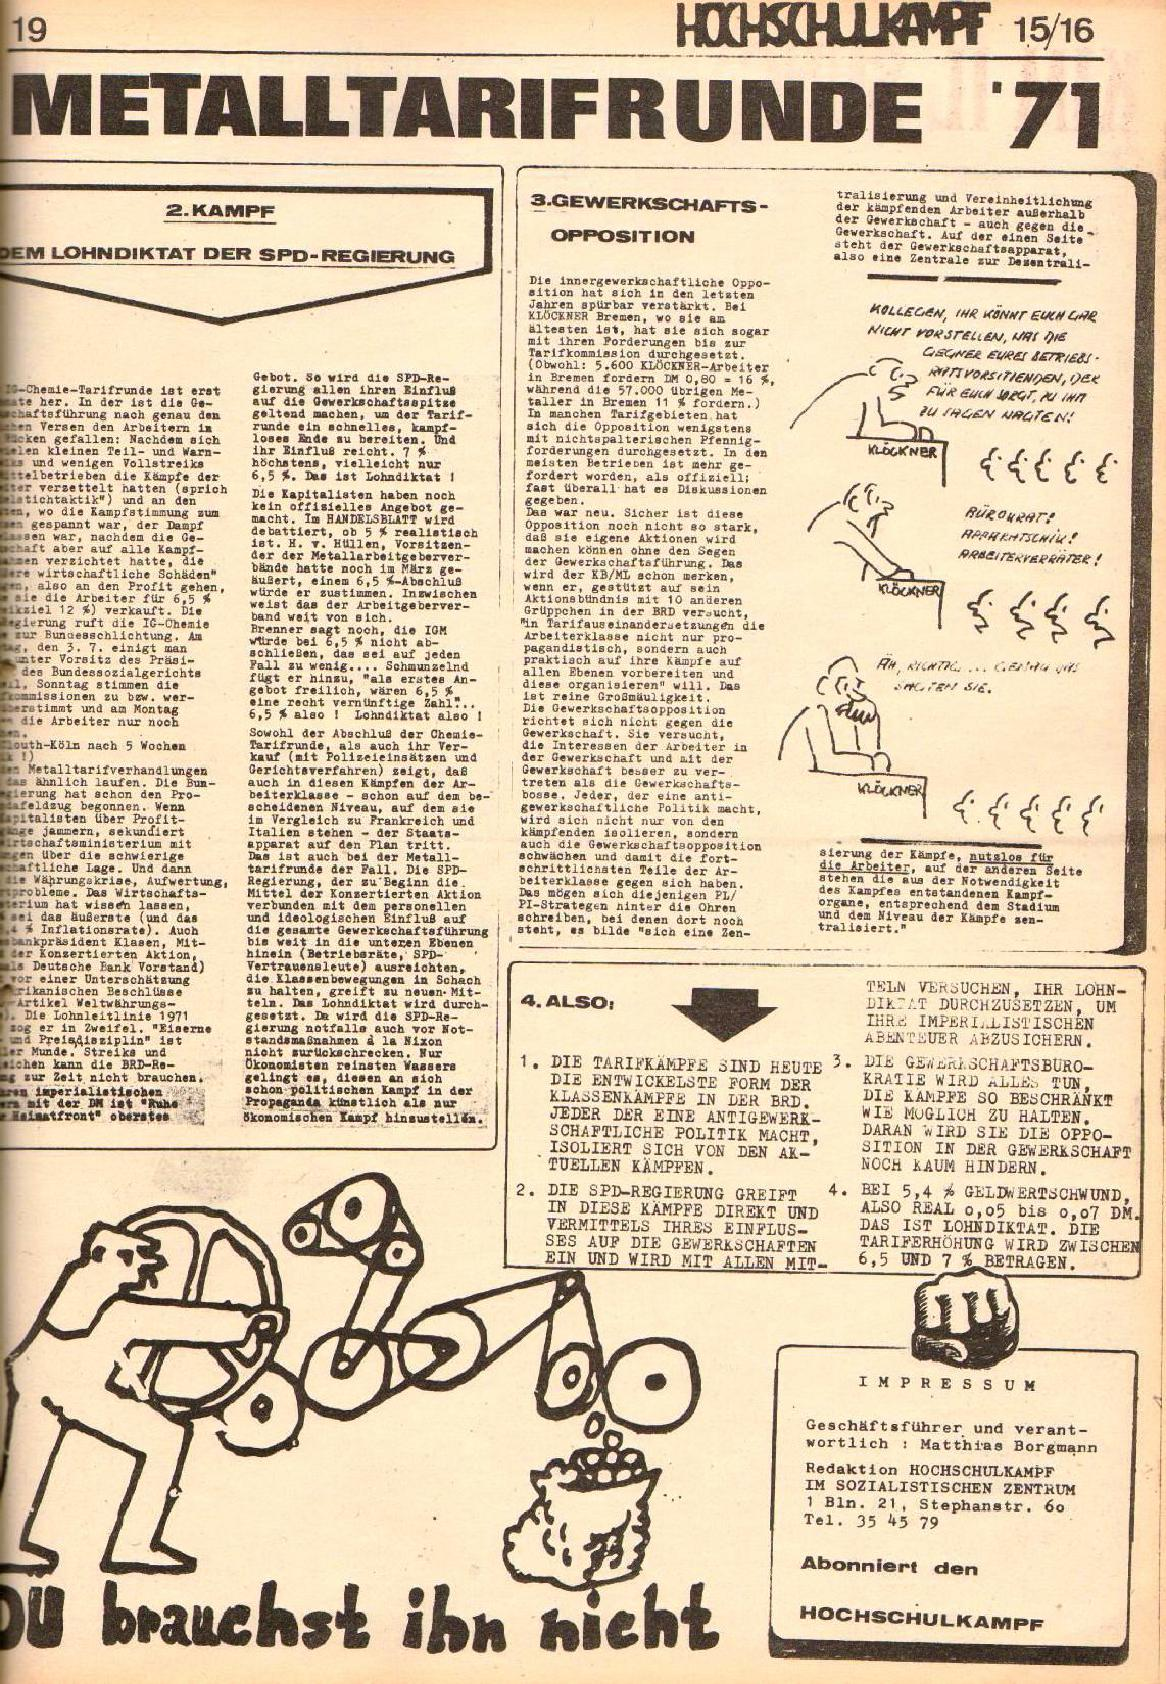 Berlin_Hochschulkampf_1971_15_19